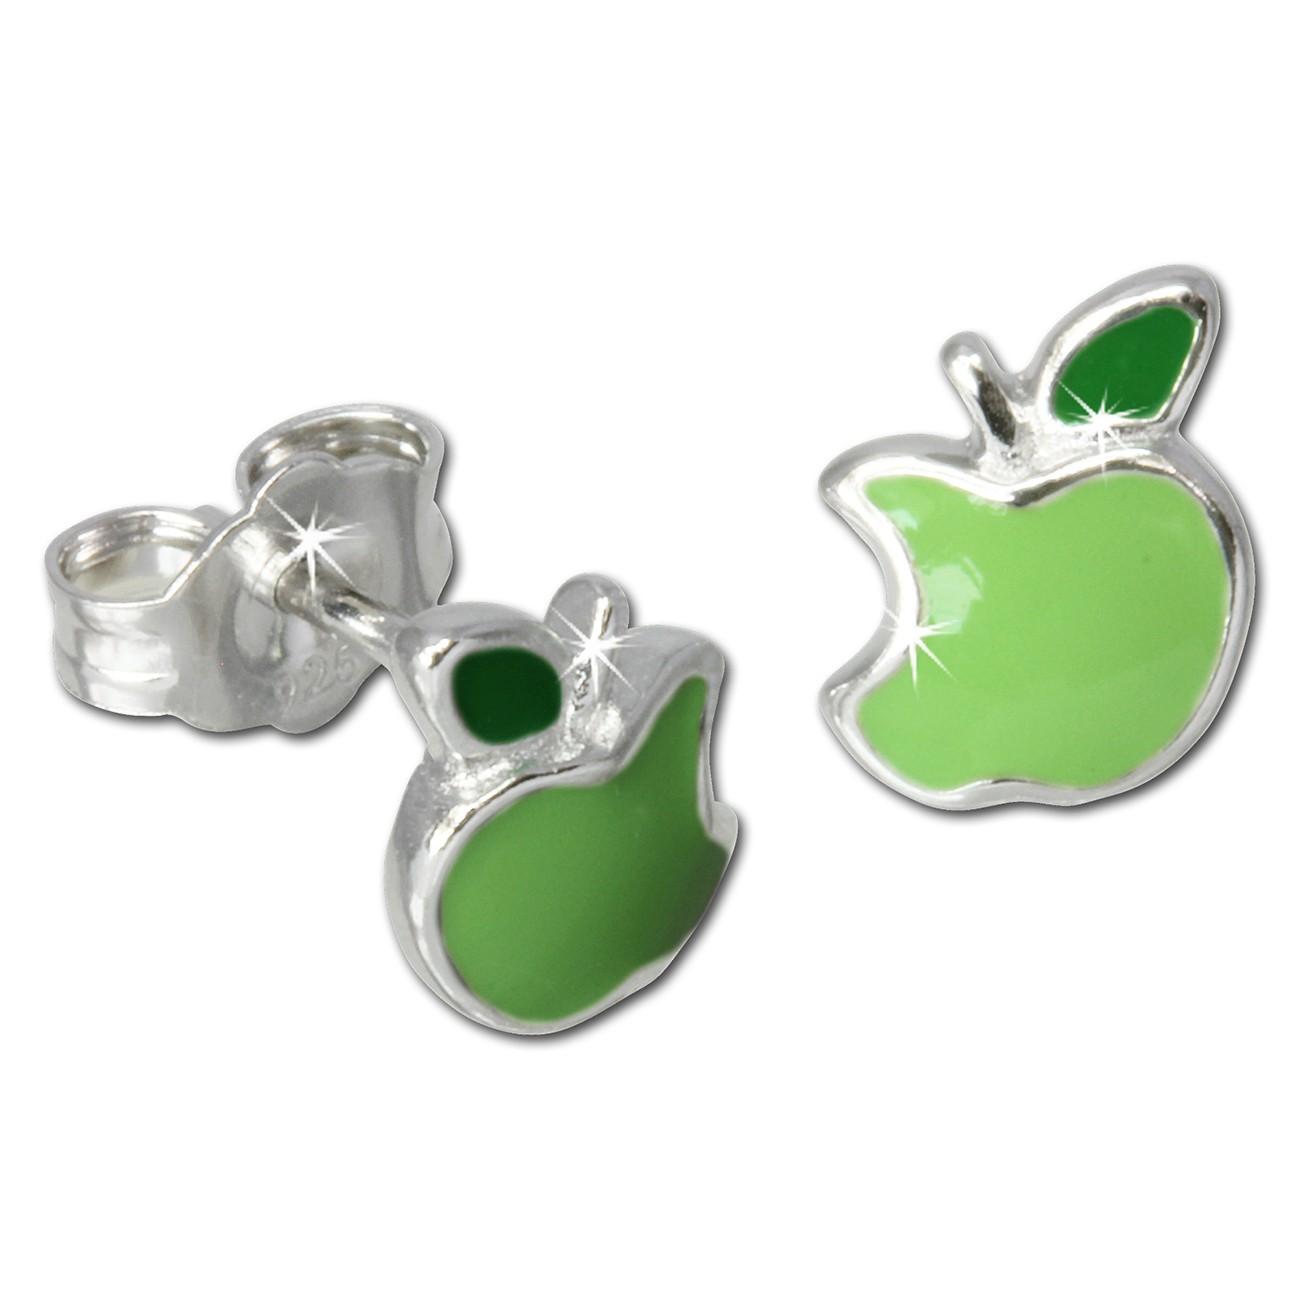 Kinder Ohrring Apfel grün Silber Ohrstecker Kinderschmuck TW SDO604G